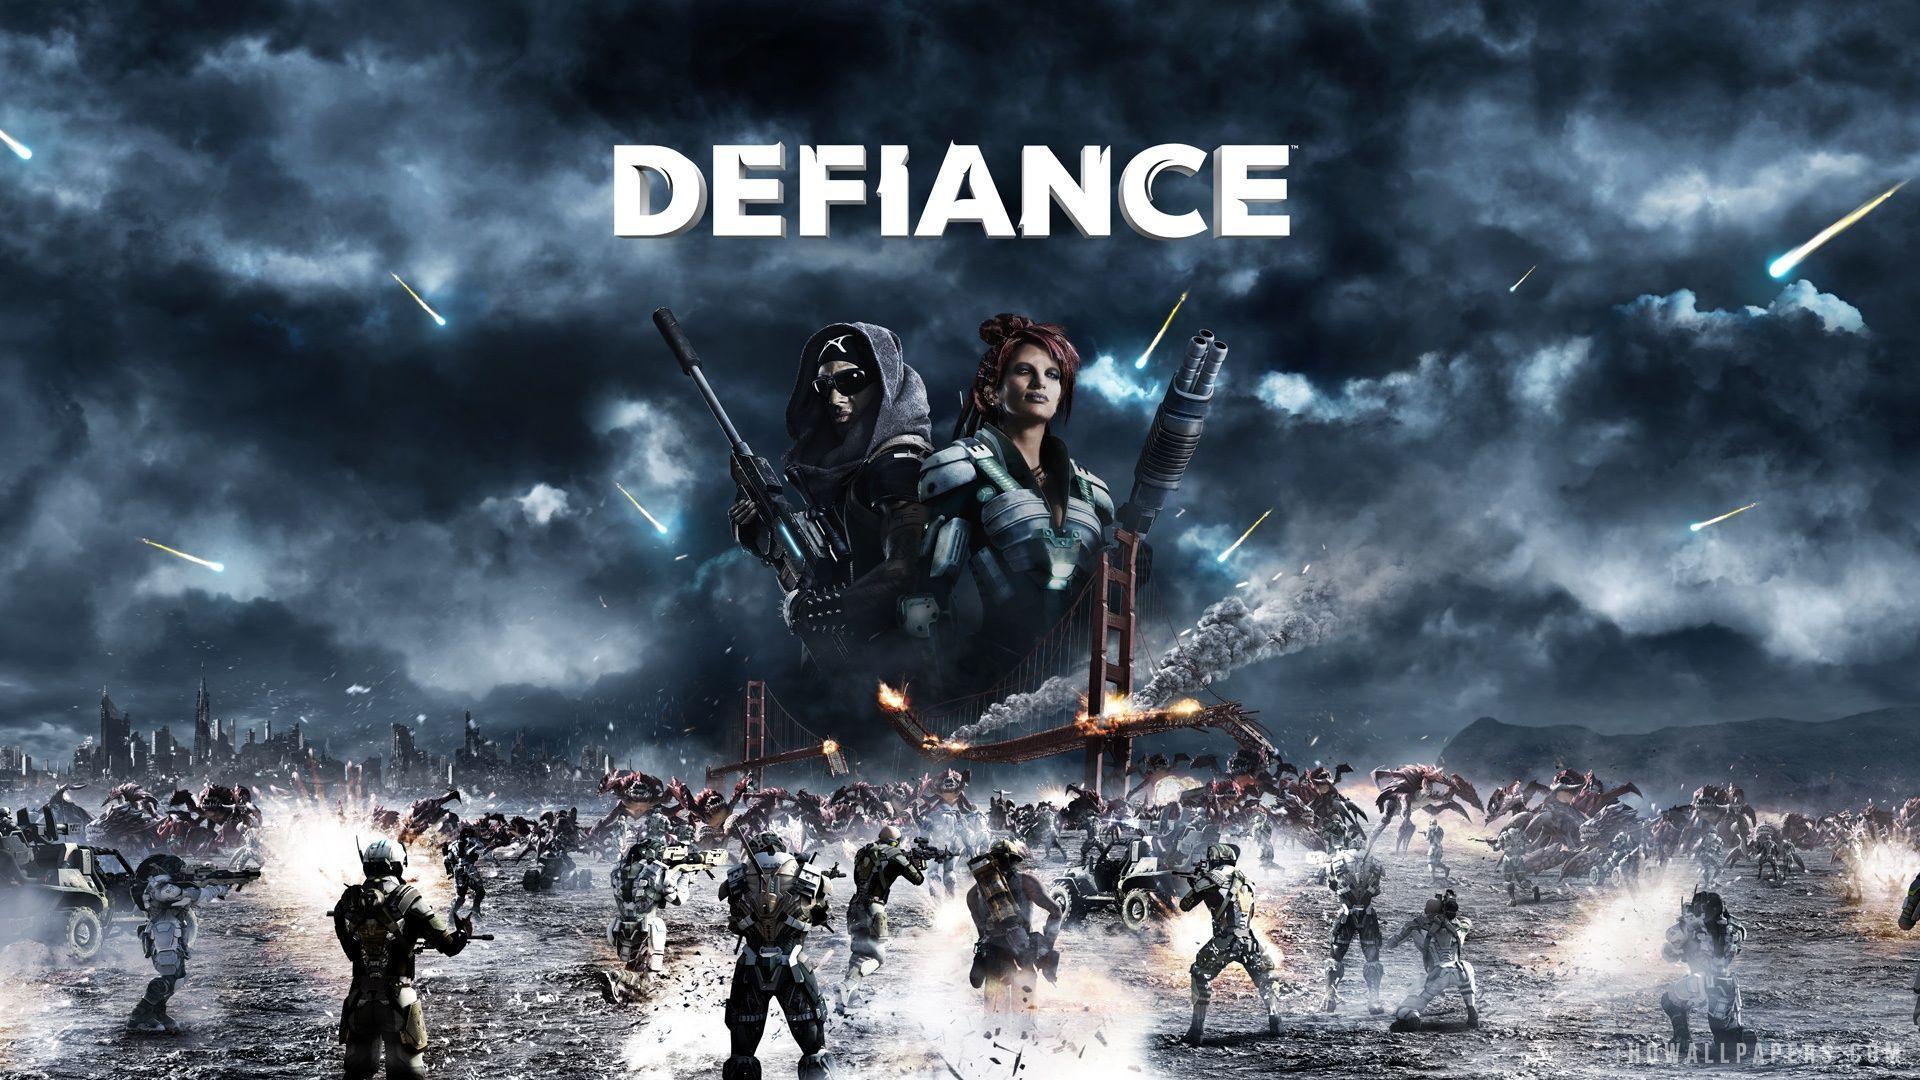 Defiance Game Wallpaper